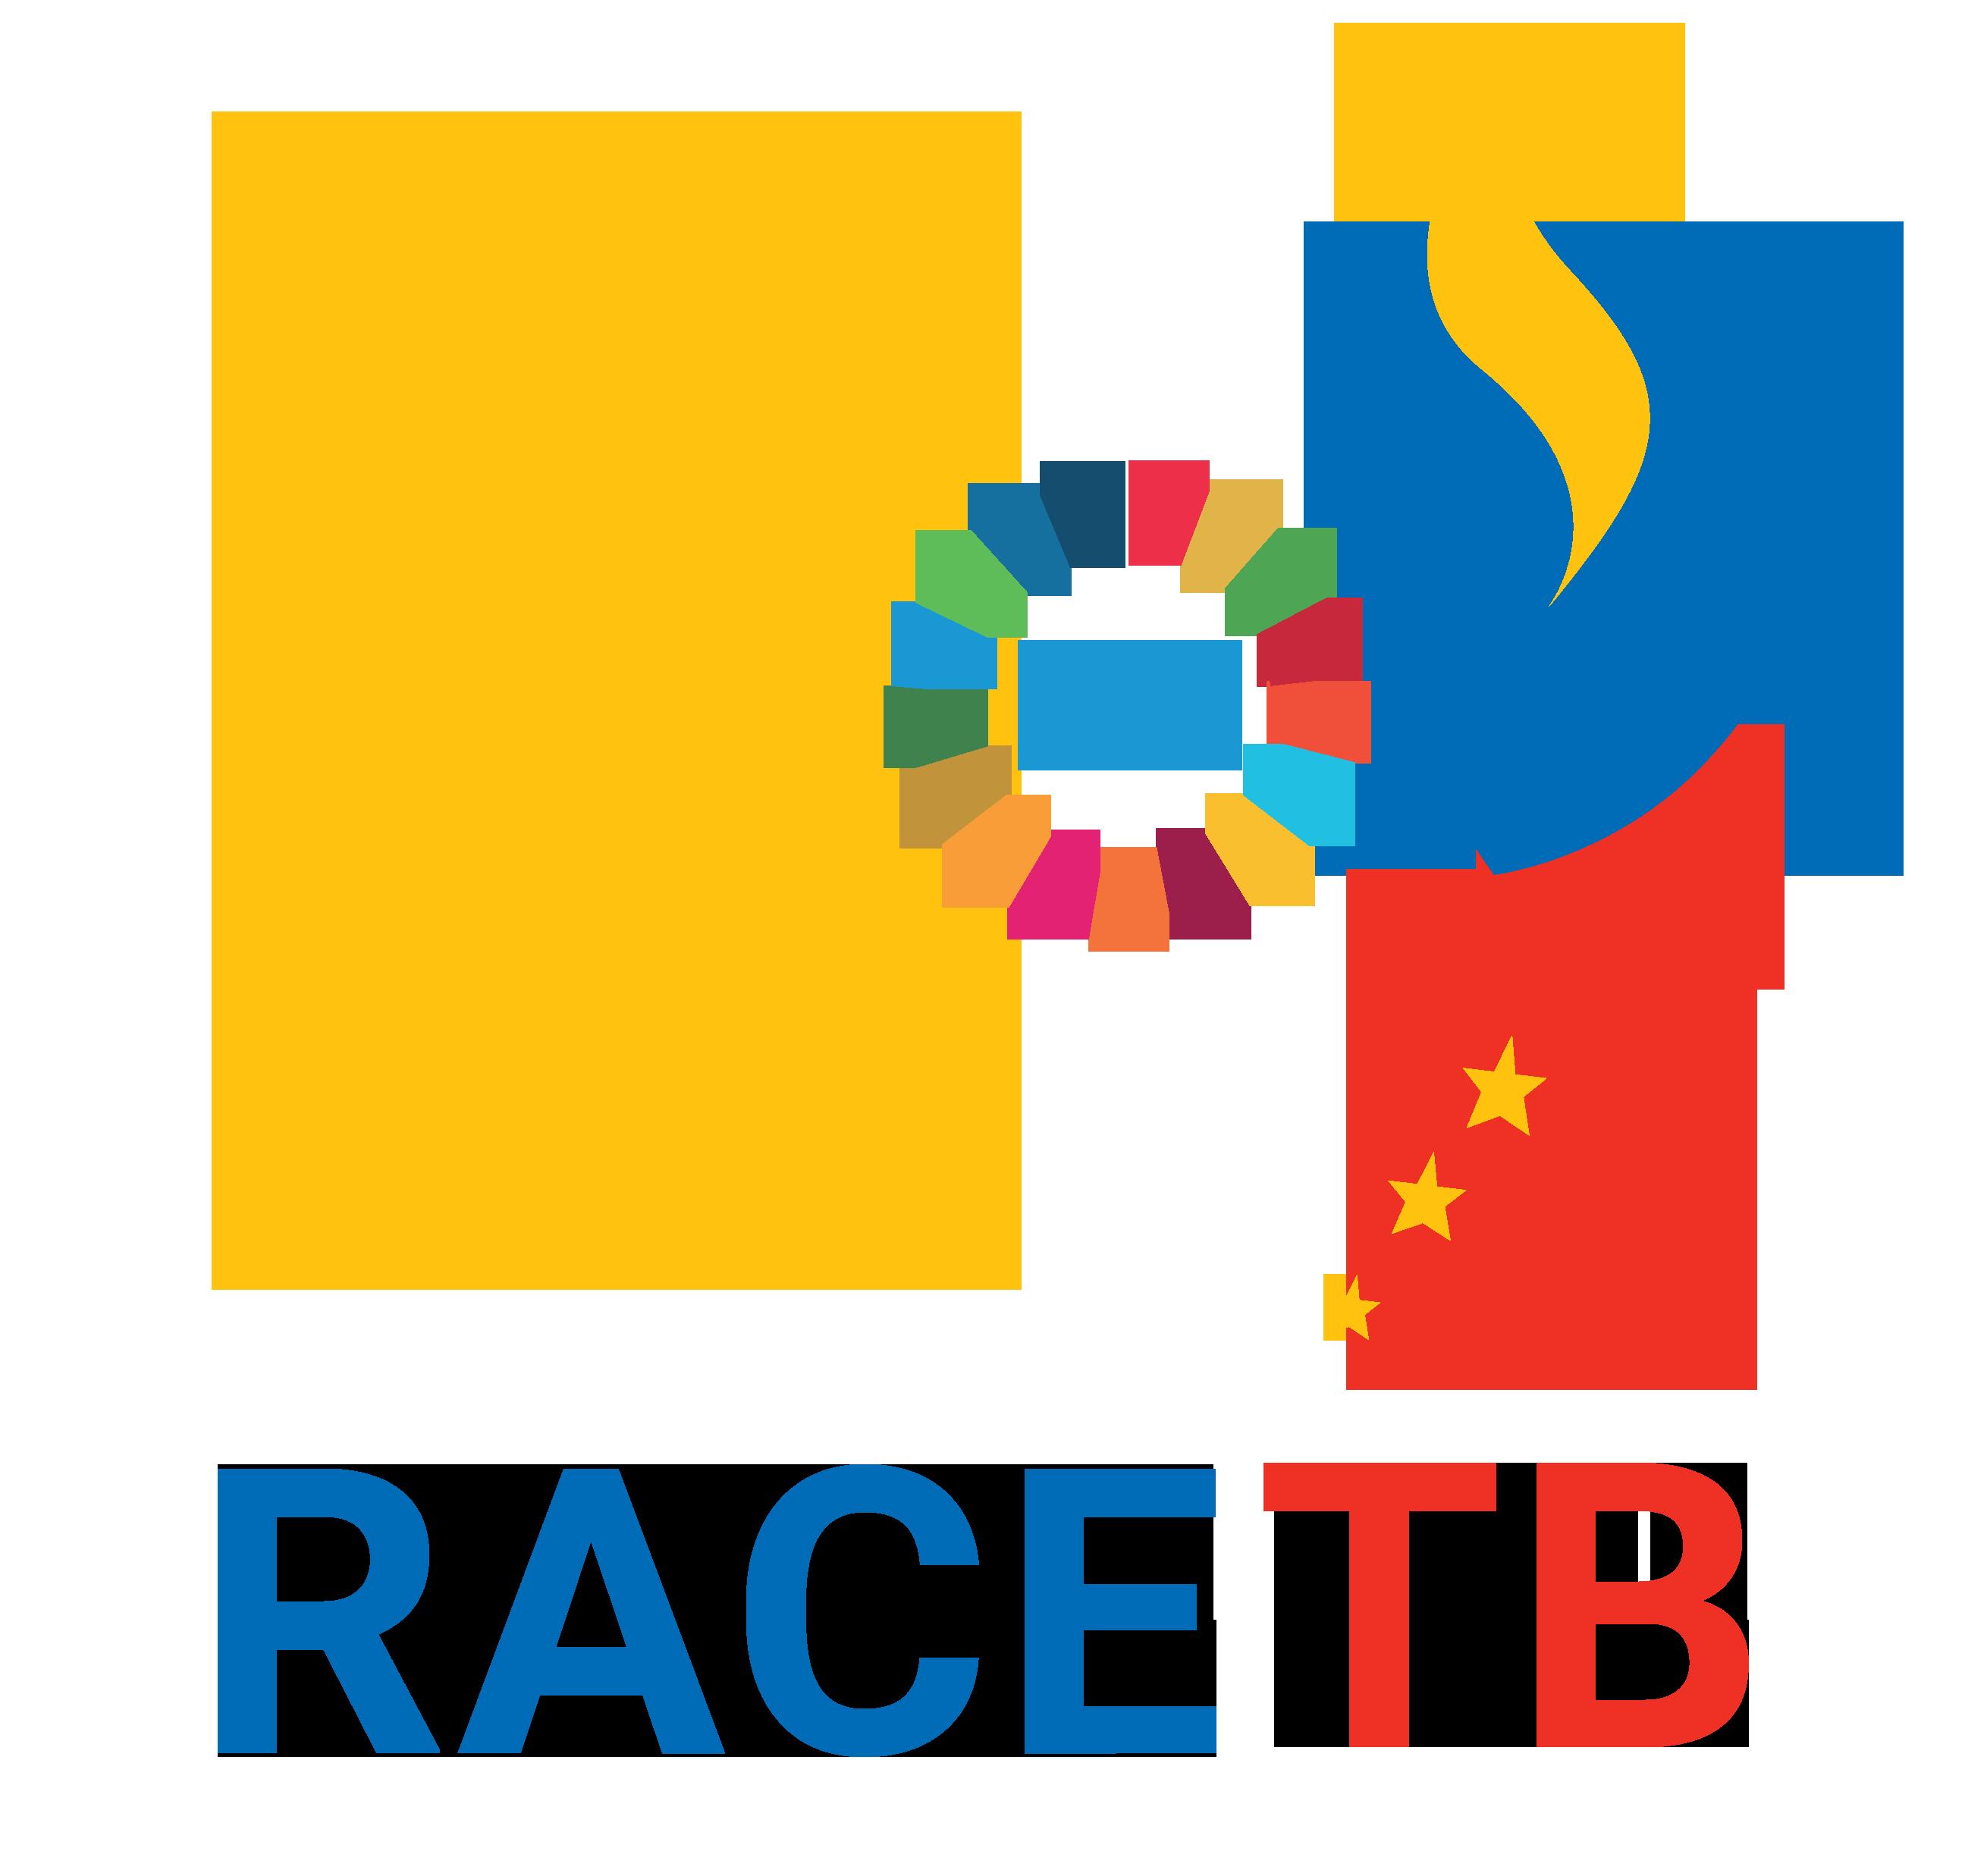 Race TB